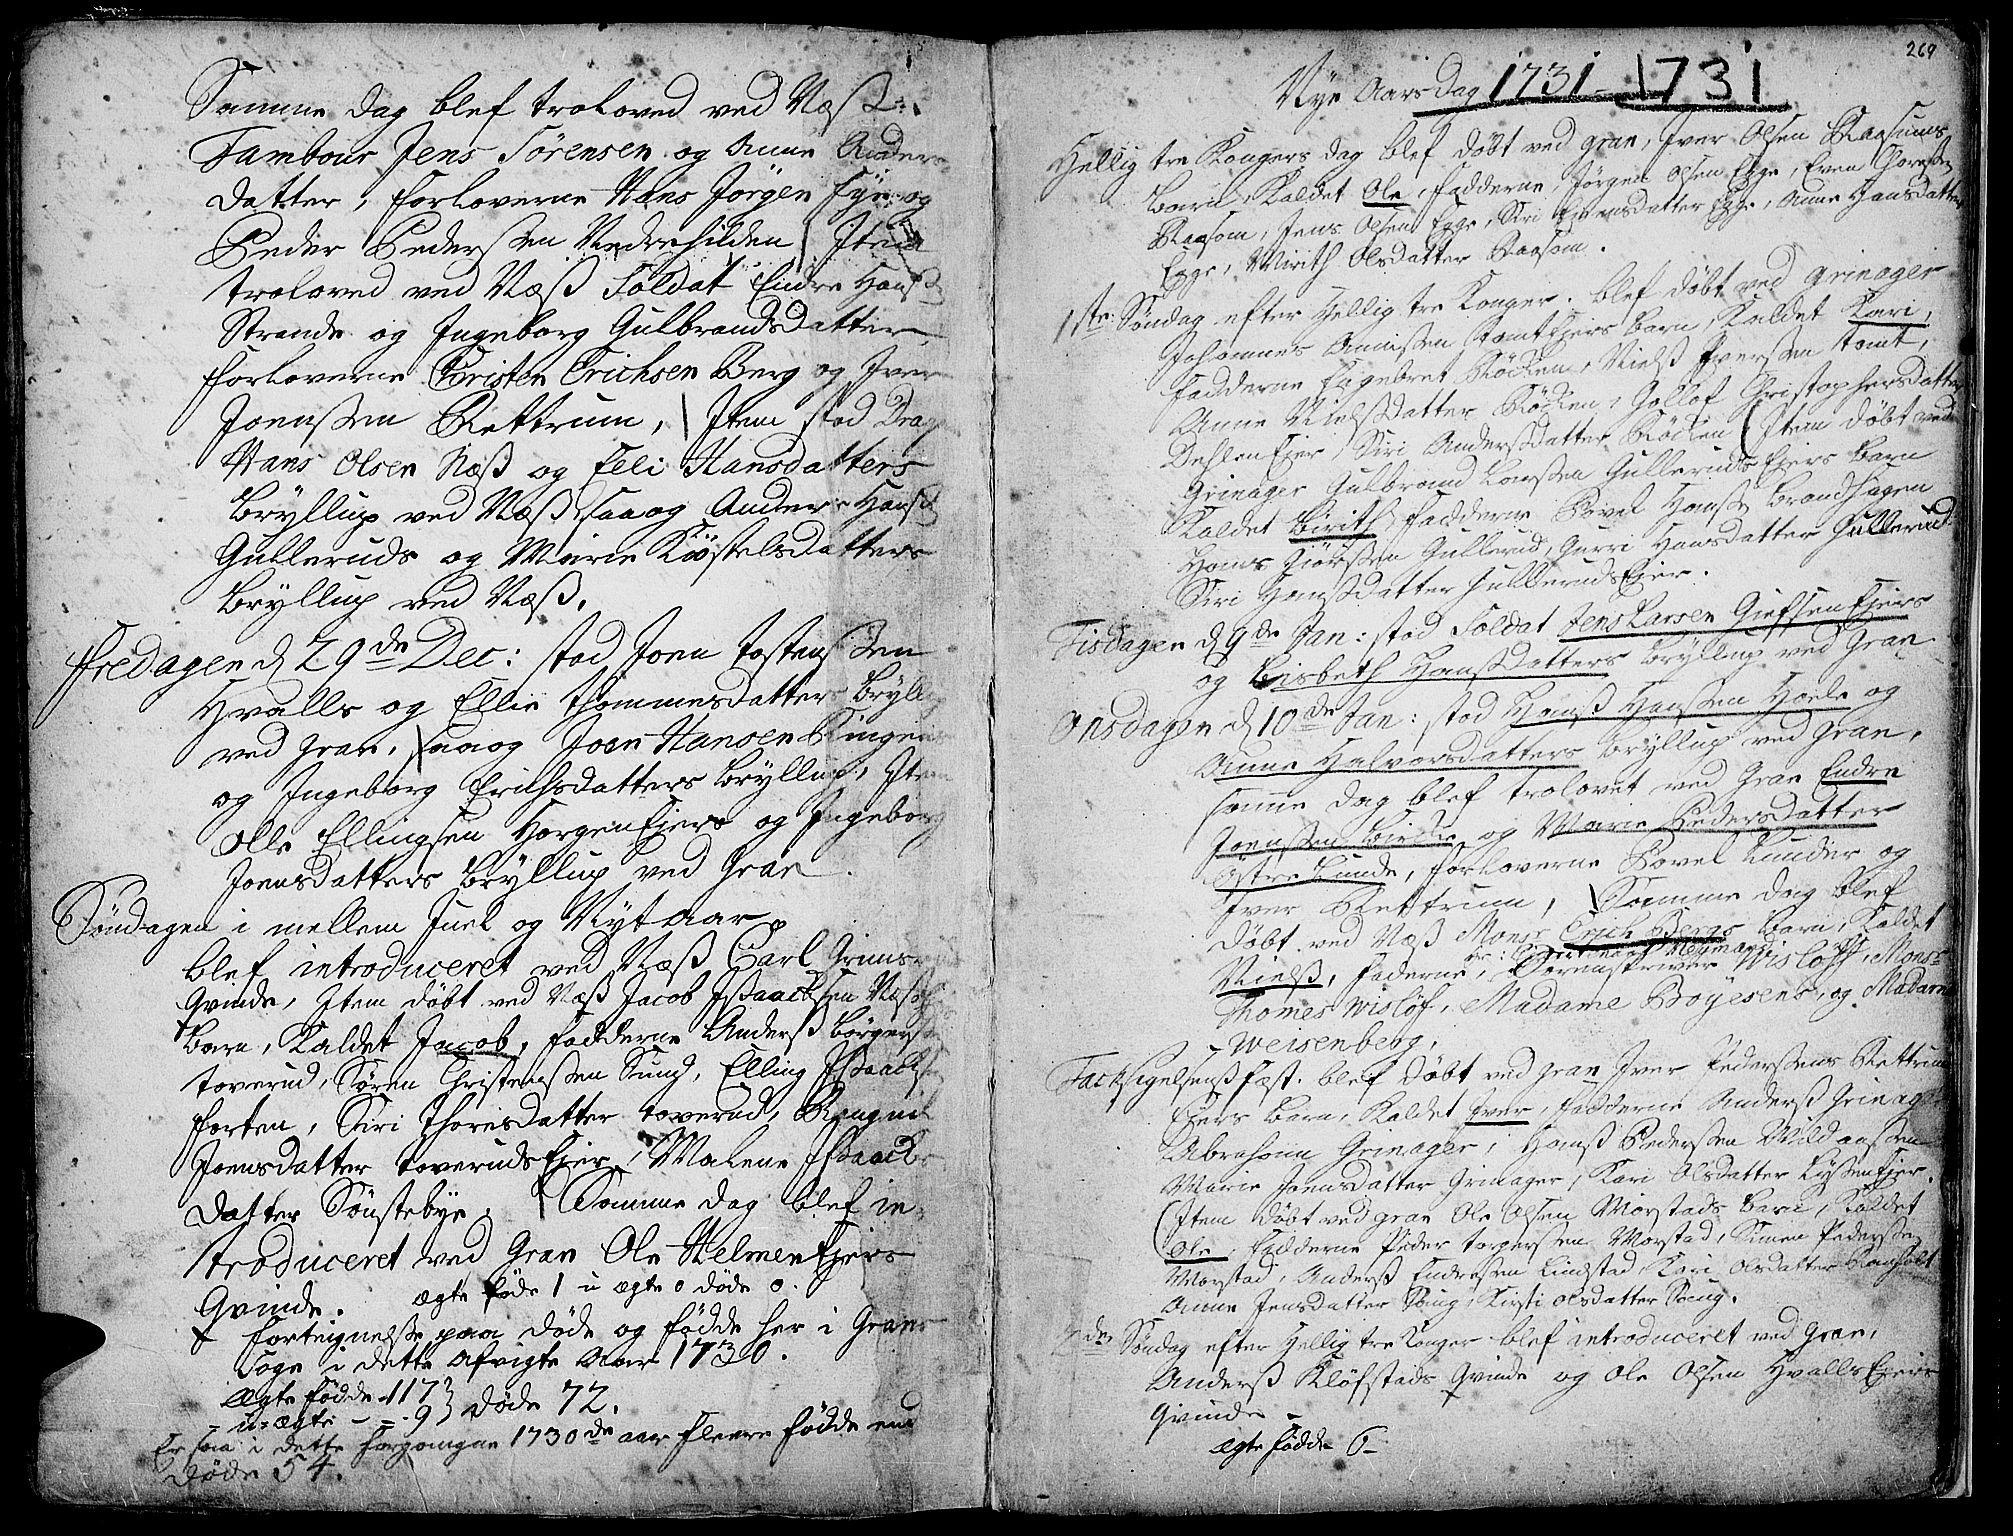 SAH, Gran prestekontor, Ministerialbok nr. 1, 1707-1731, s. 269